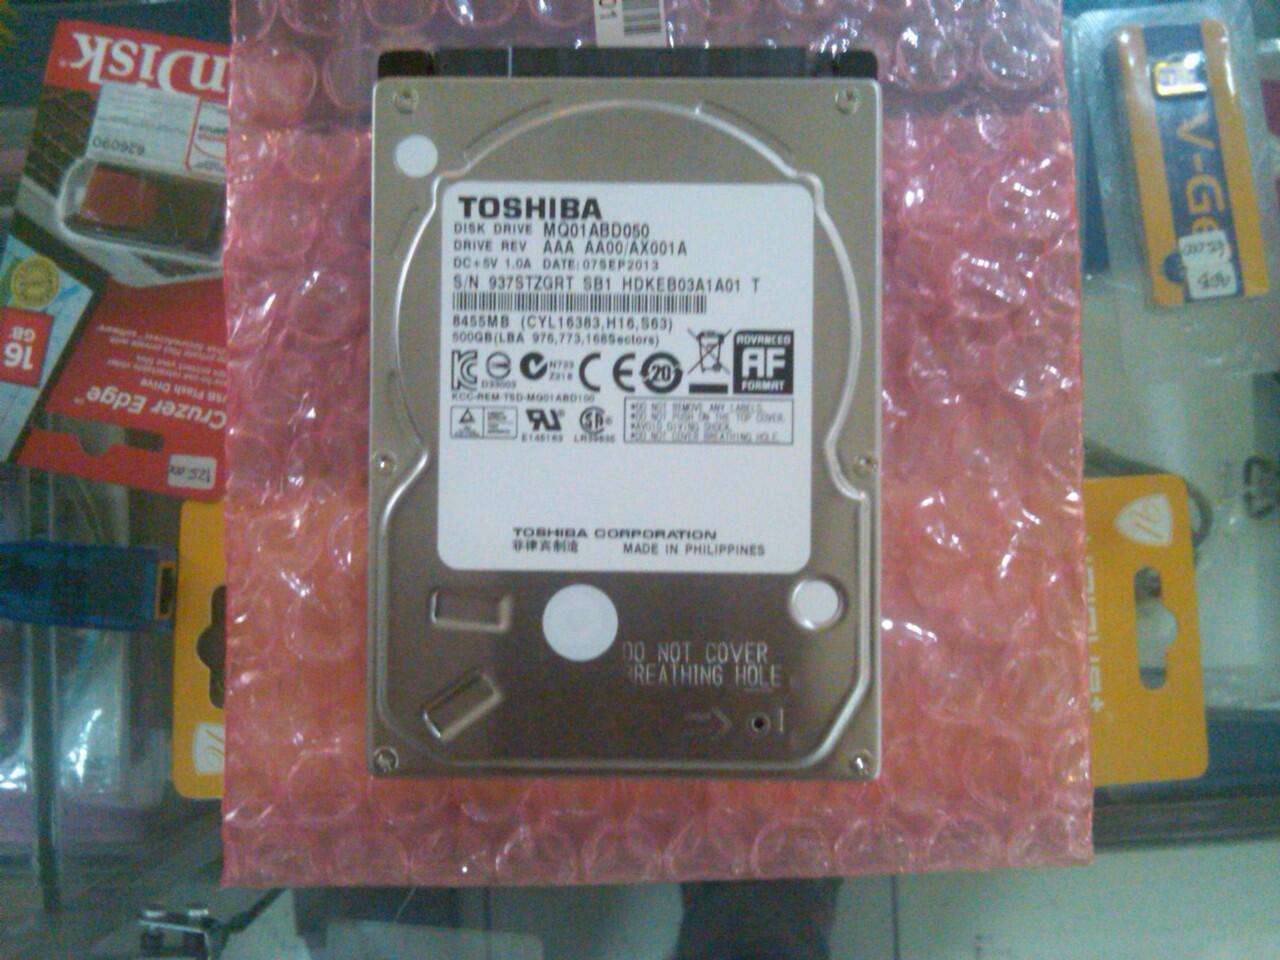 Terjual Hardisk 500gb Toshiba Buat Laptop Kaskus